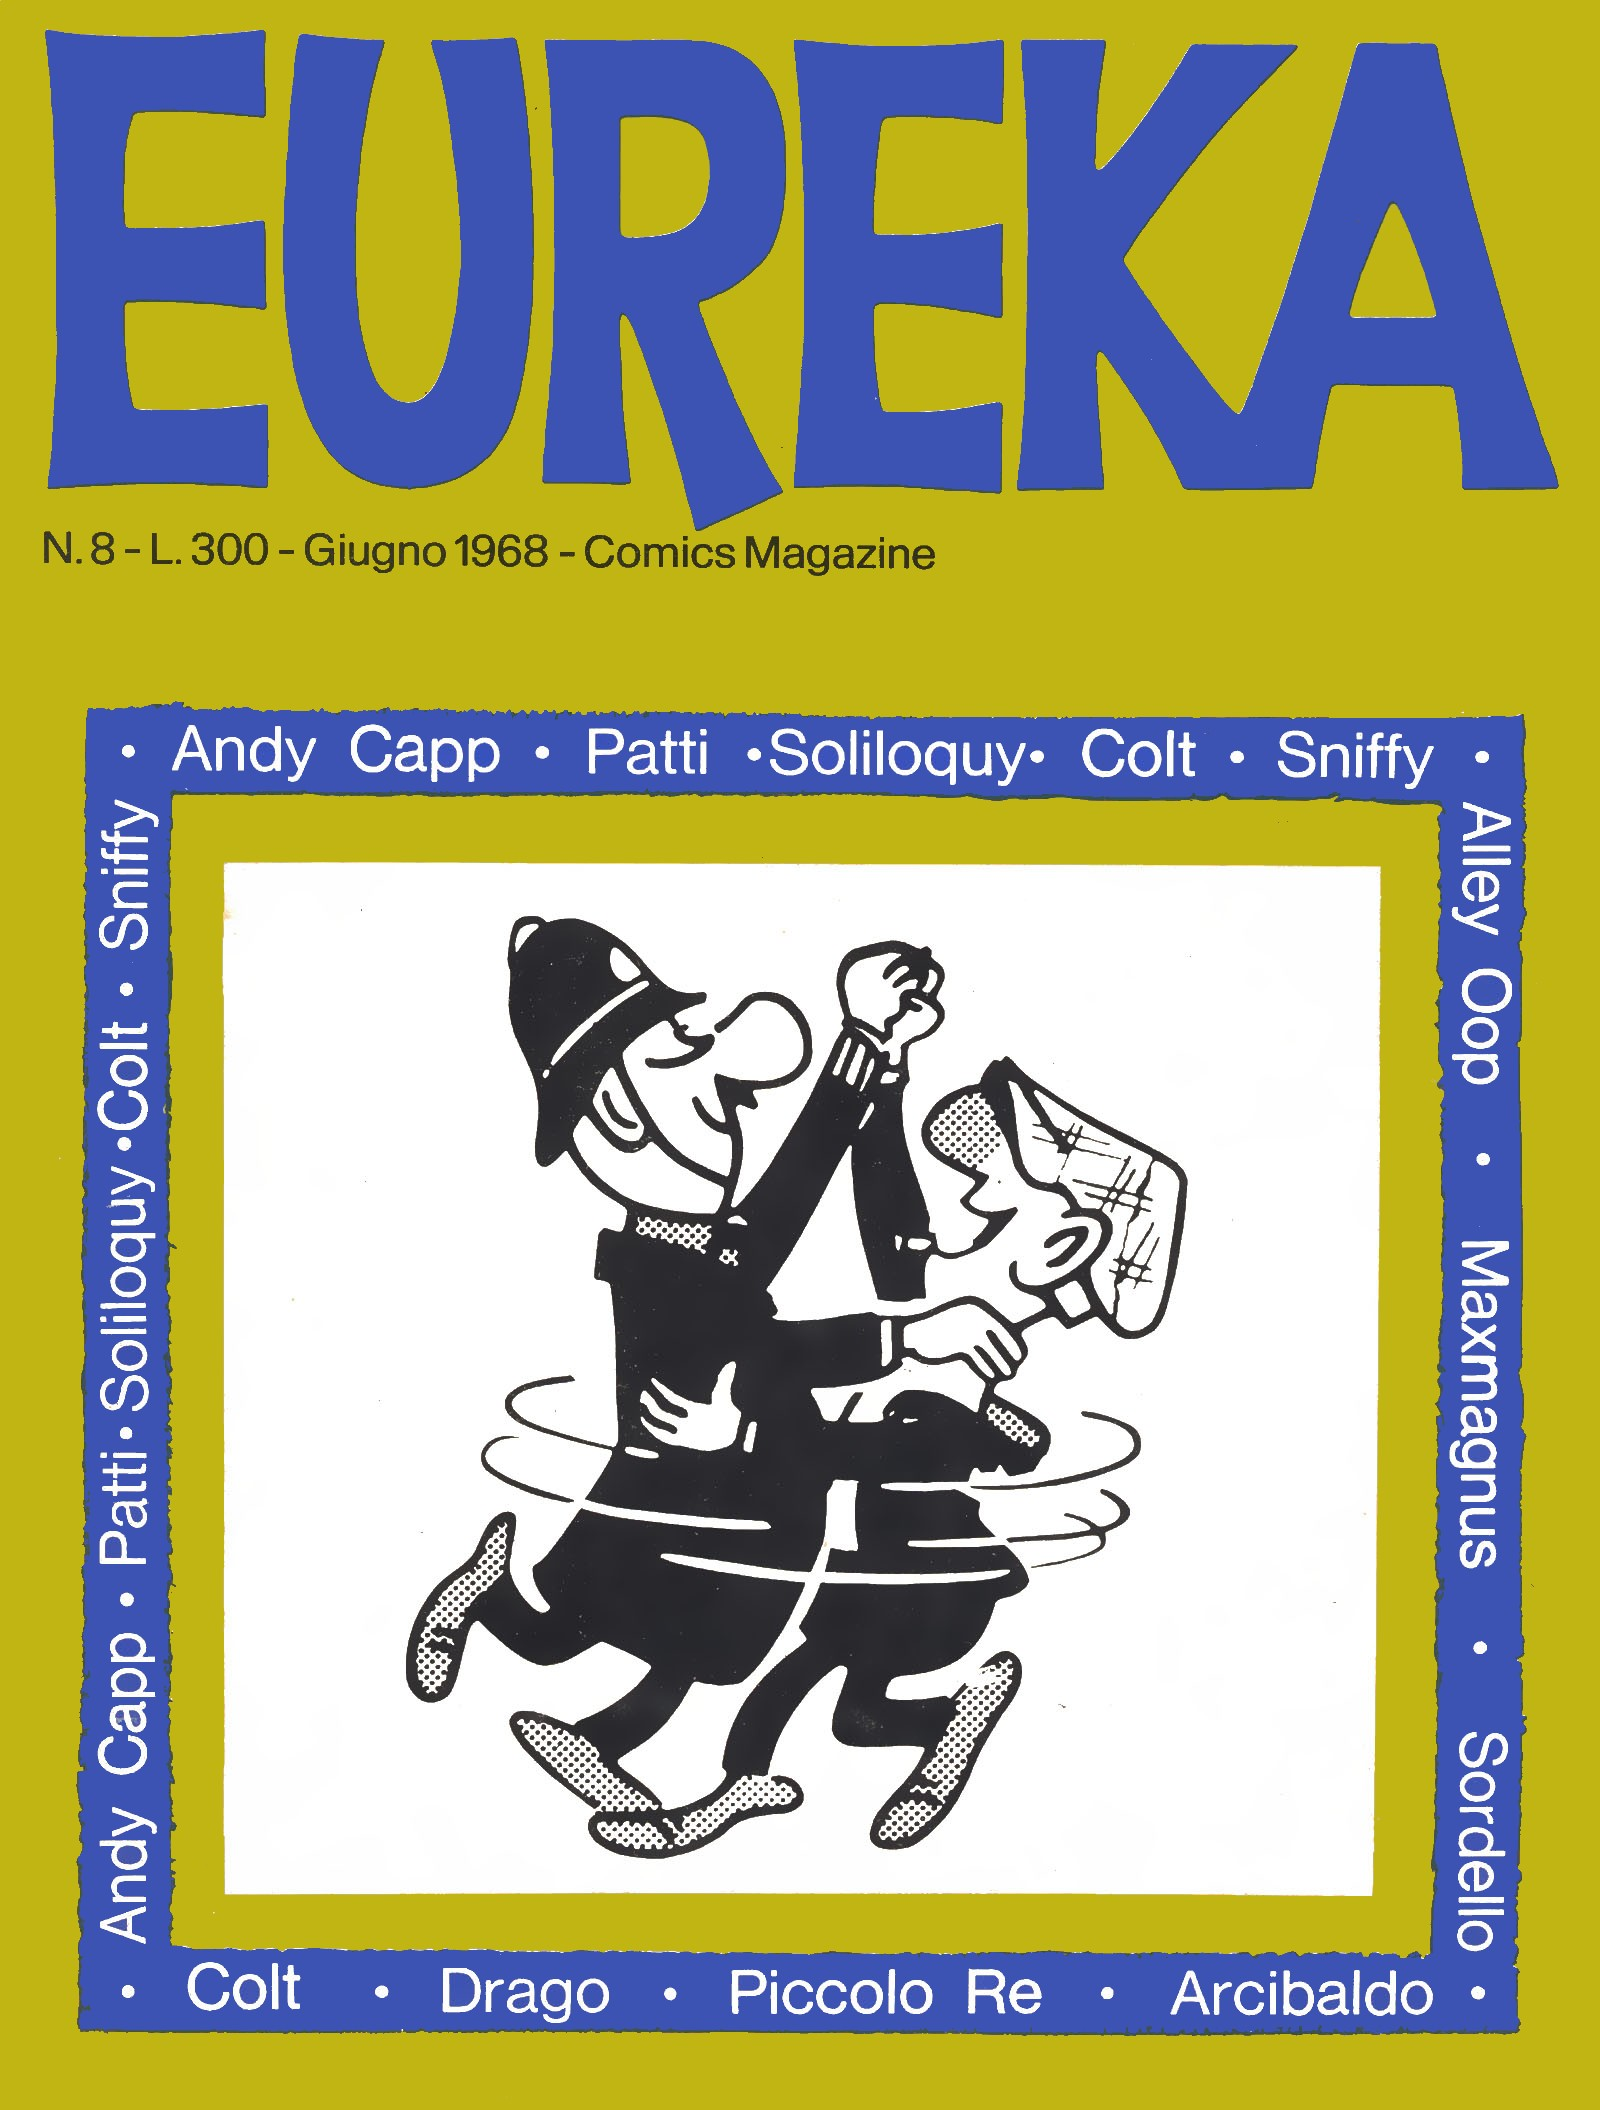 Eureka [comics magaz...